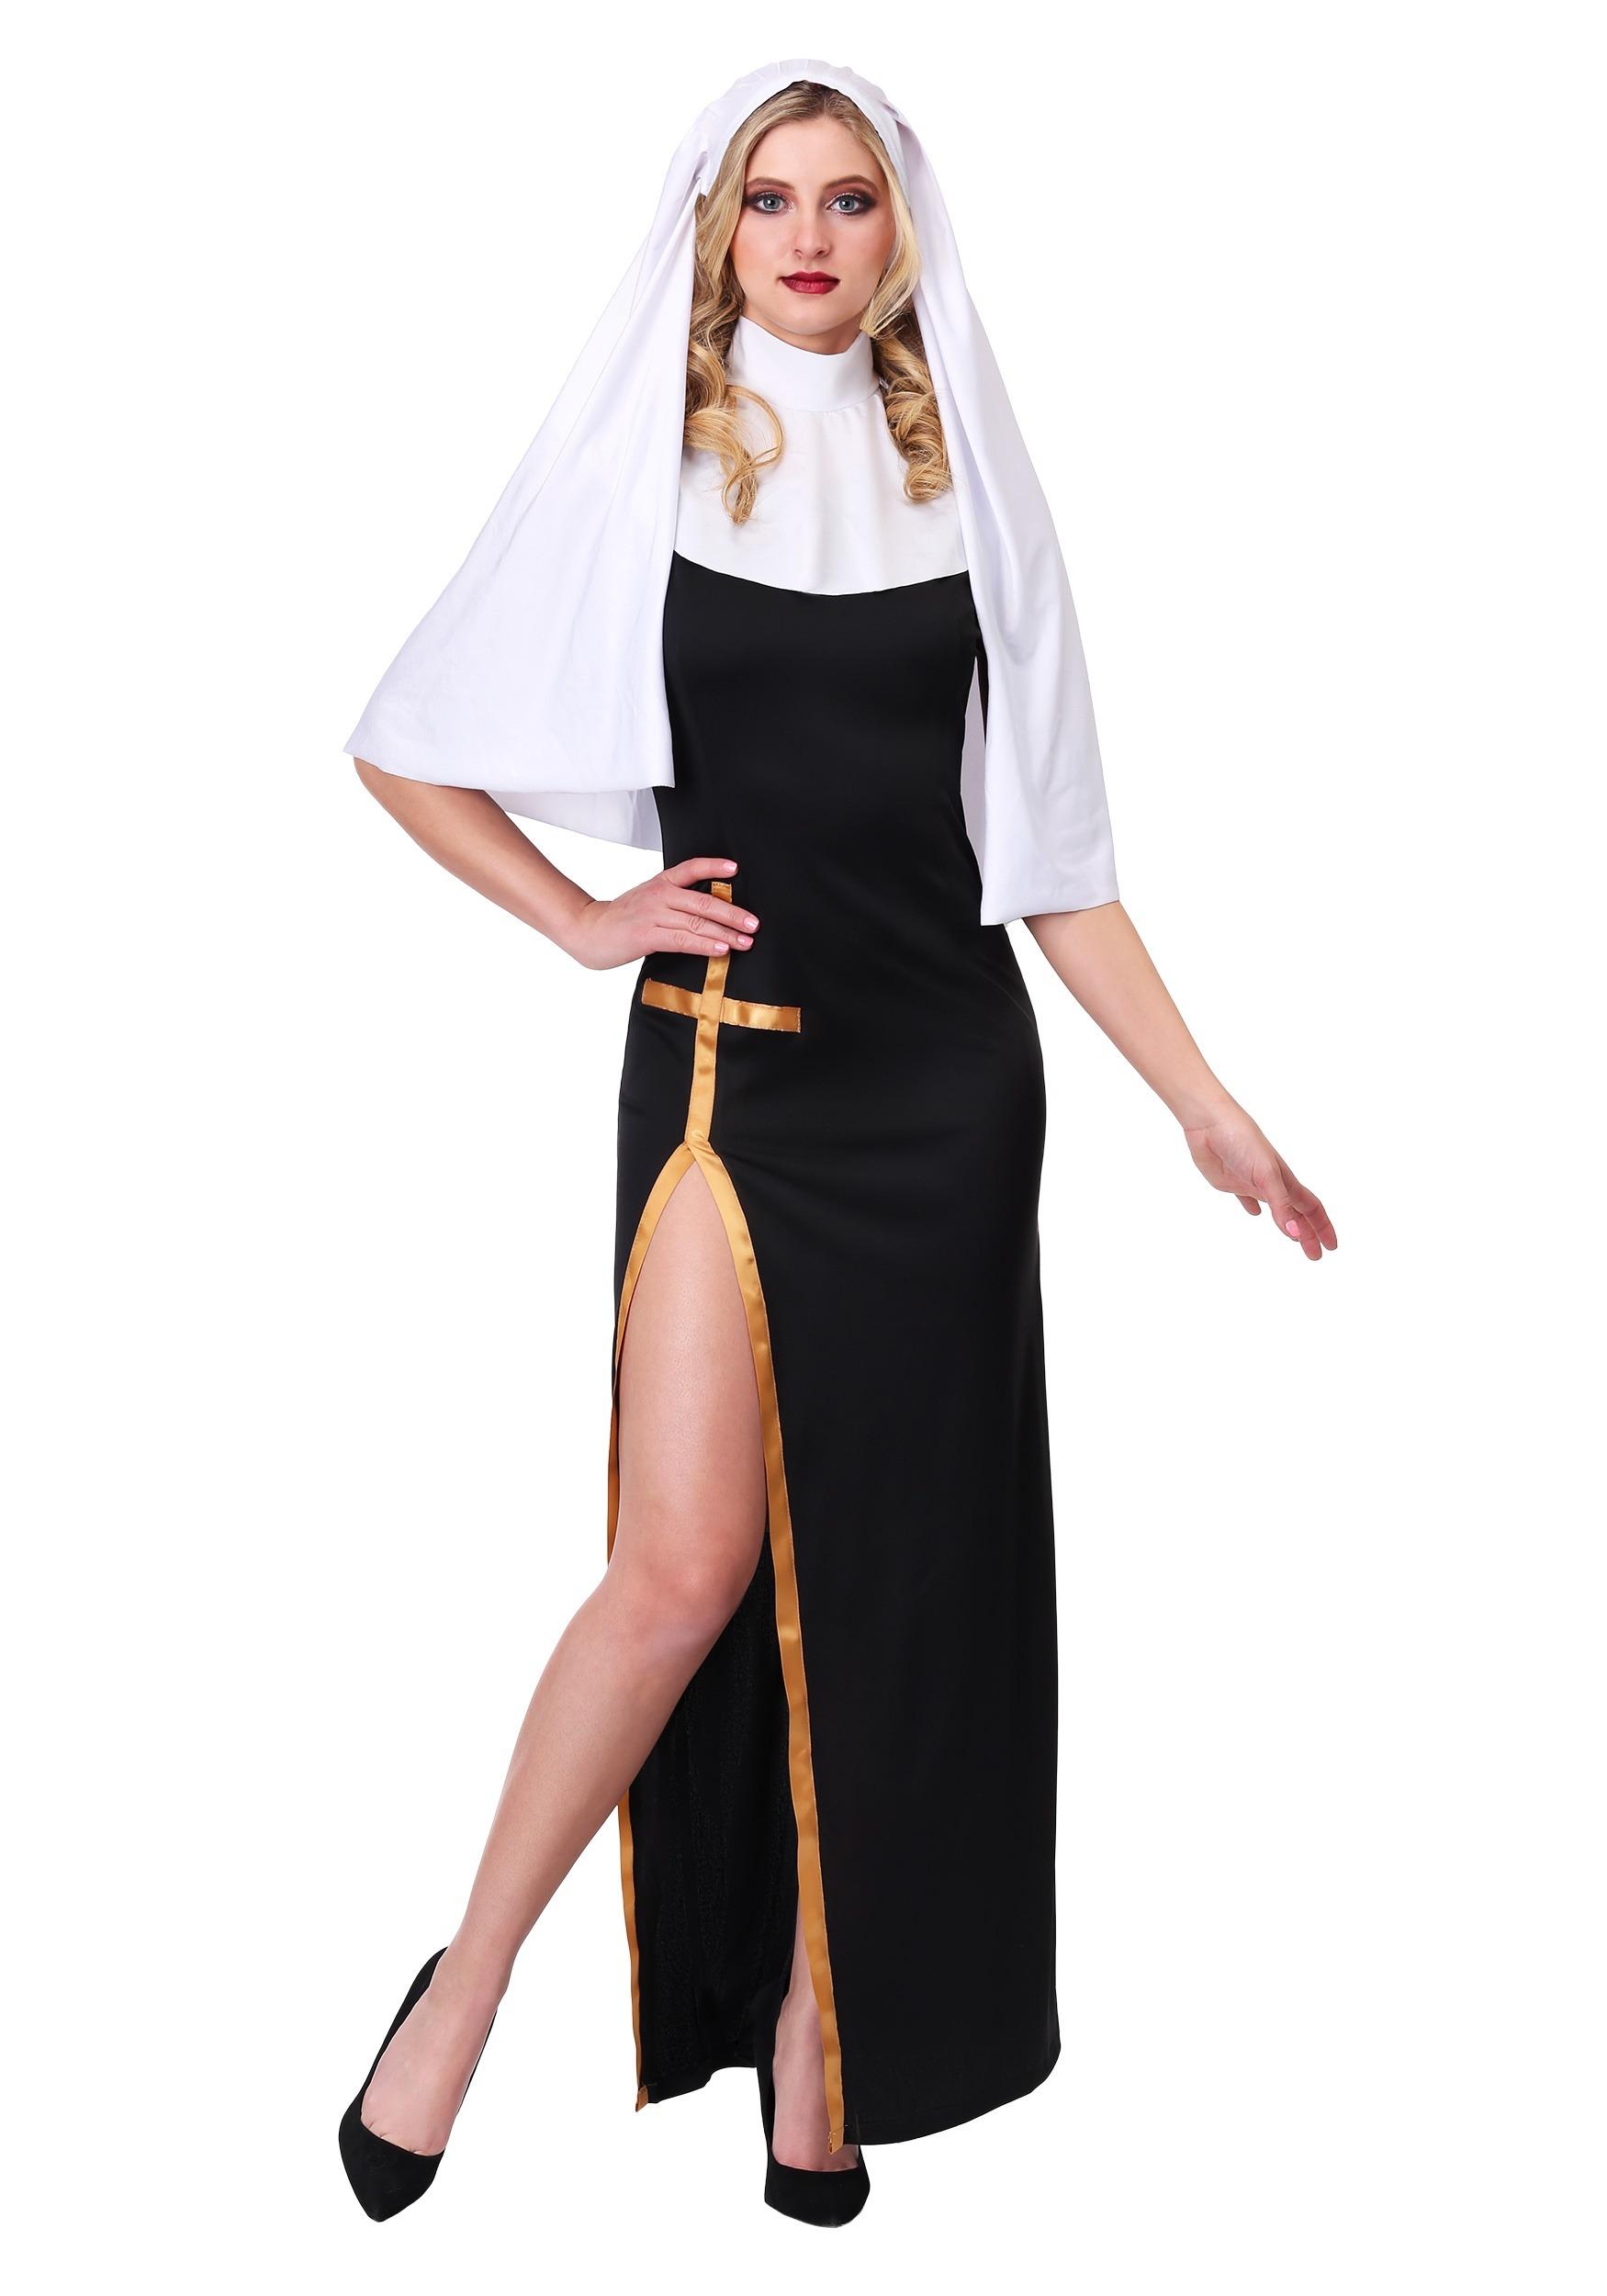 Women's Holy Nun Costume